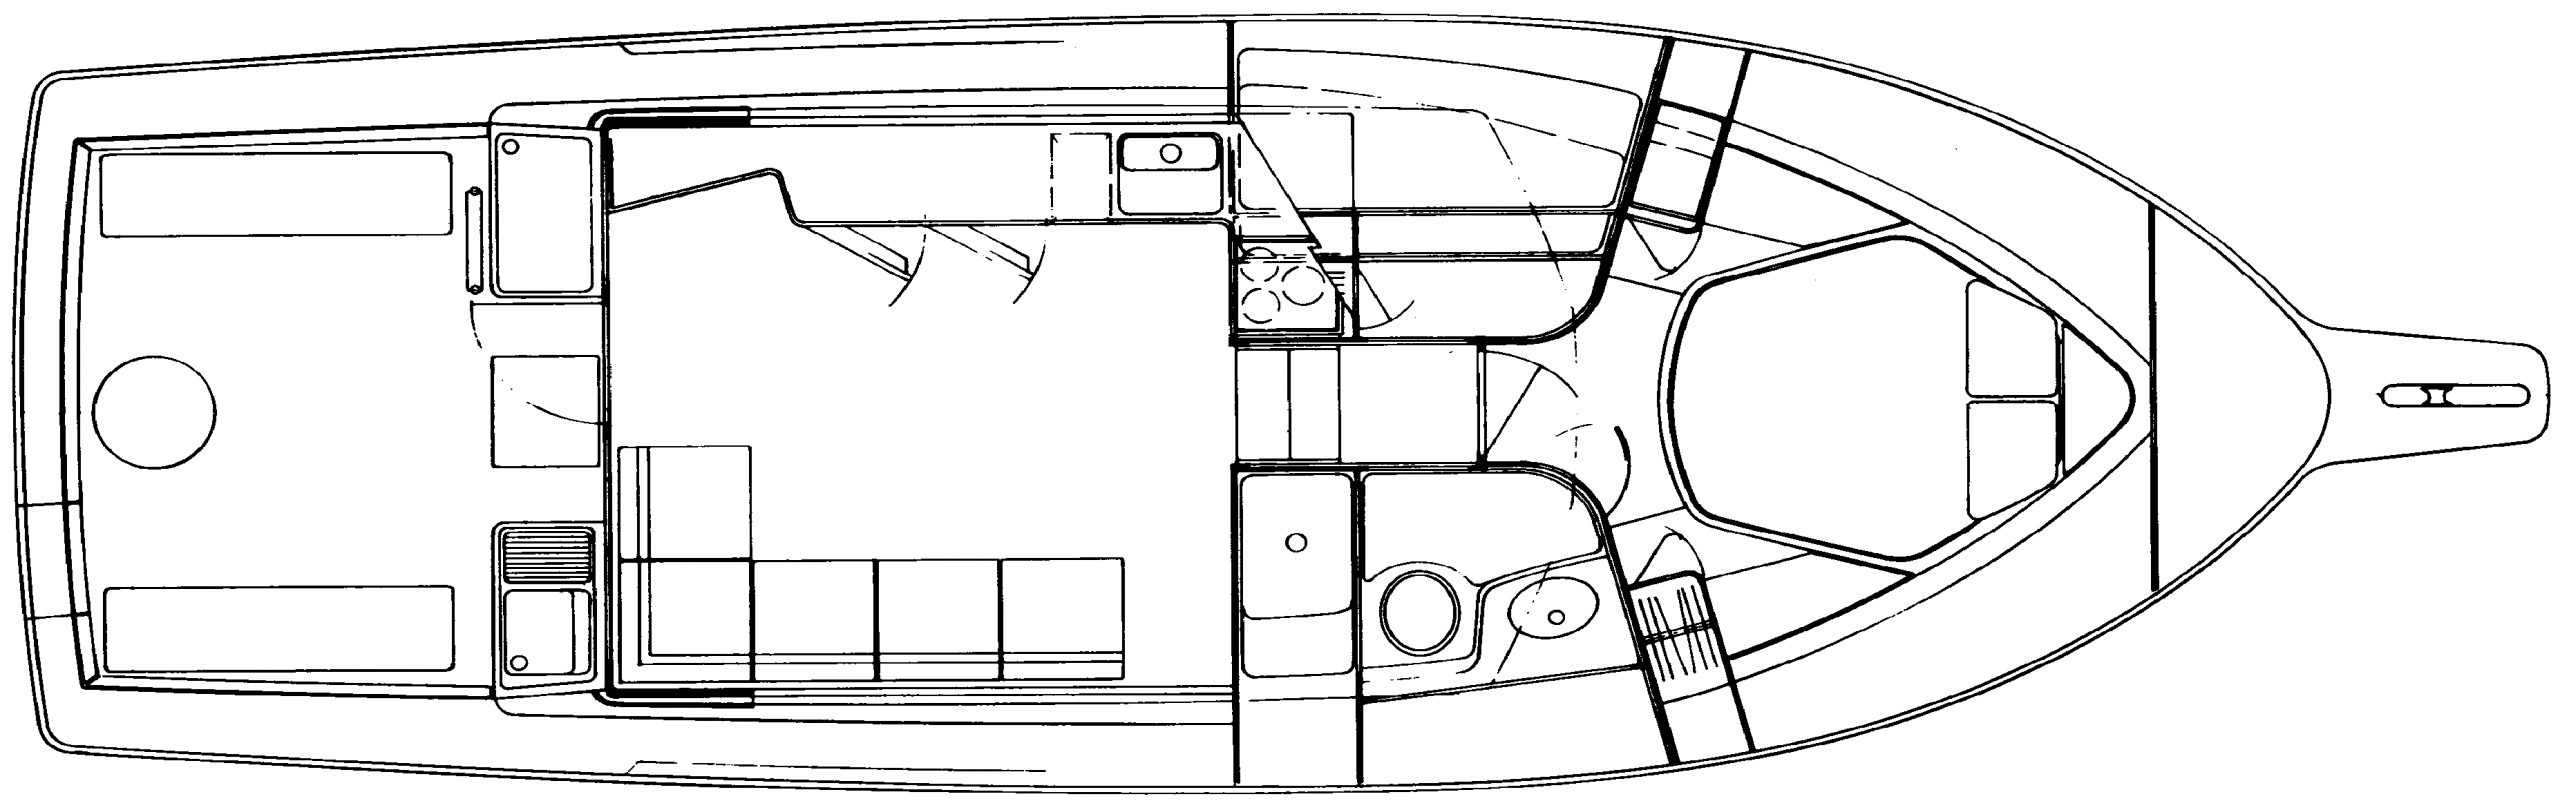 37 Convertible; 38 SFX Floor Plan 1